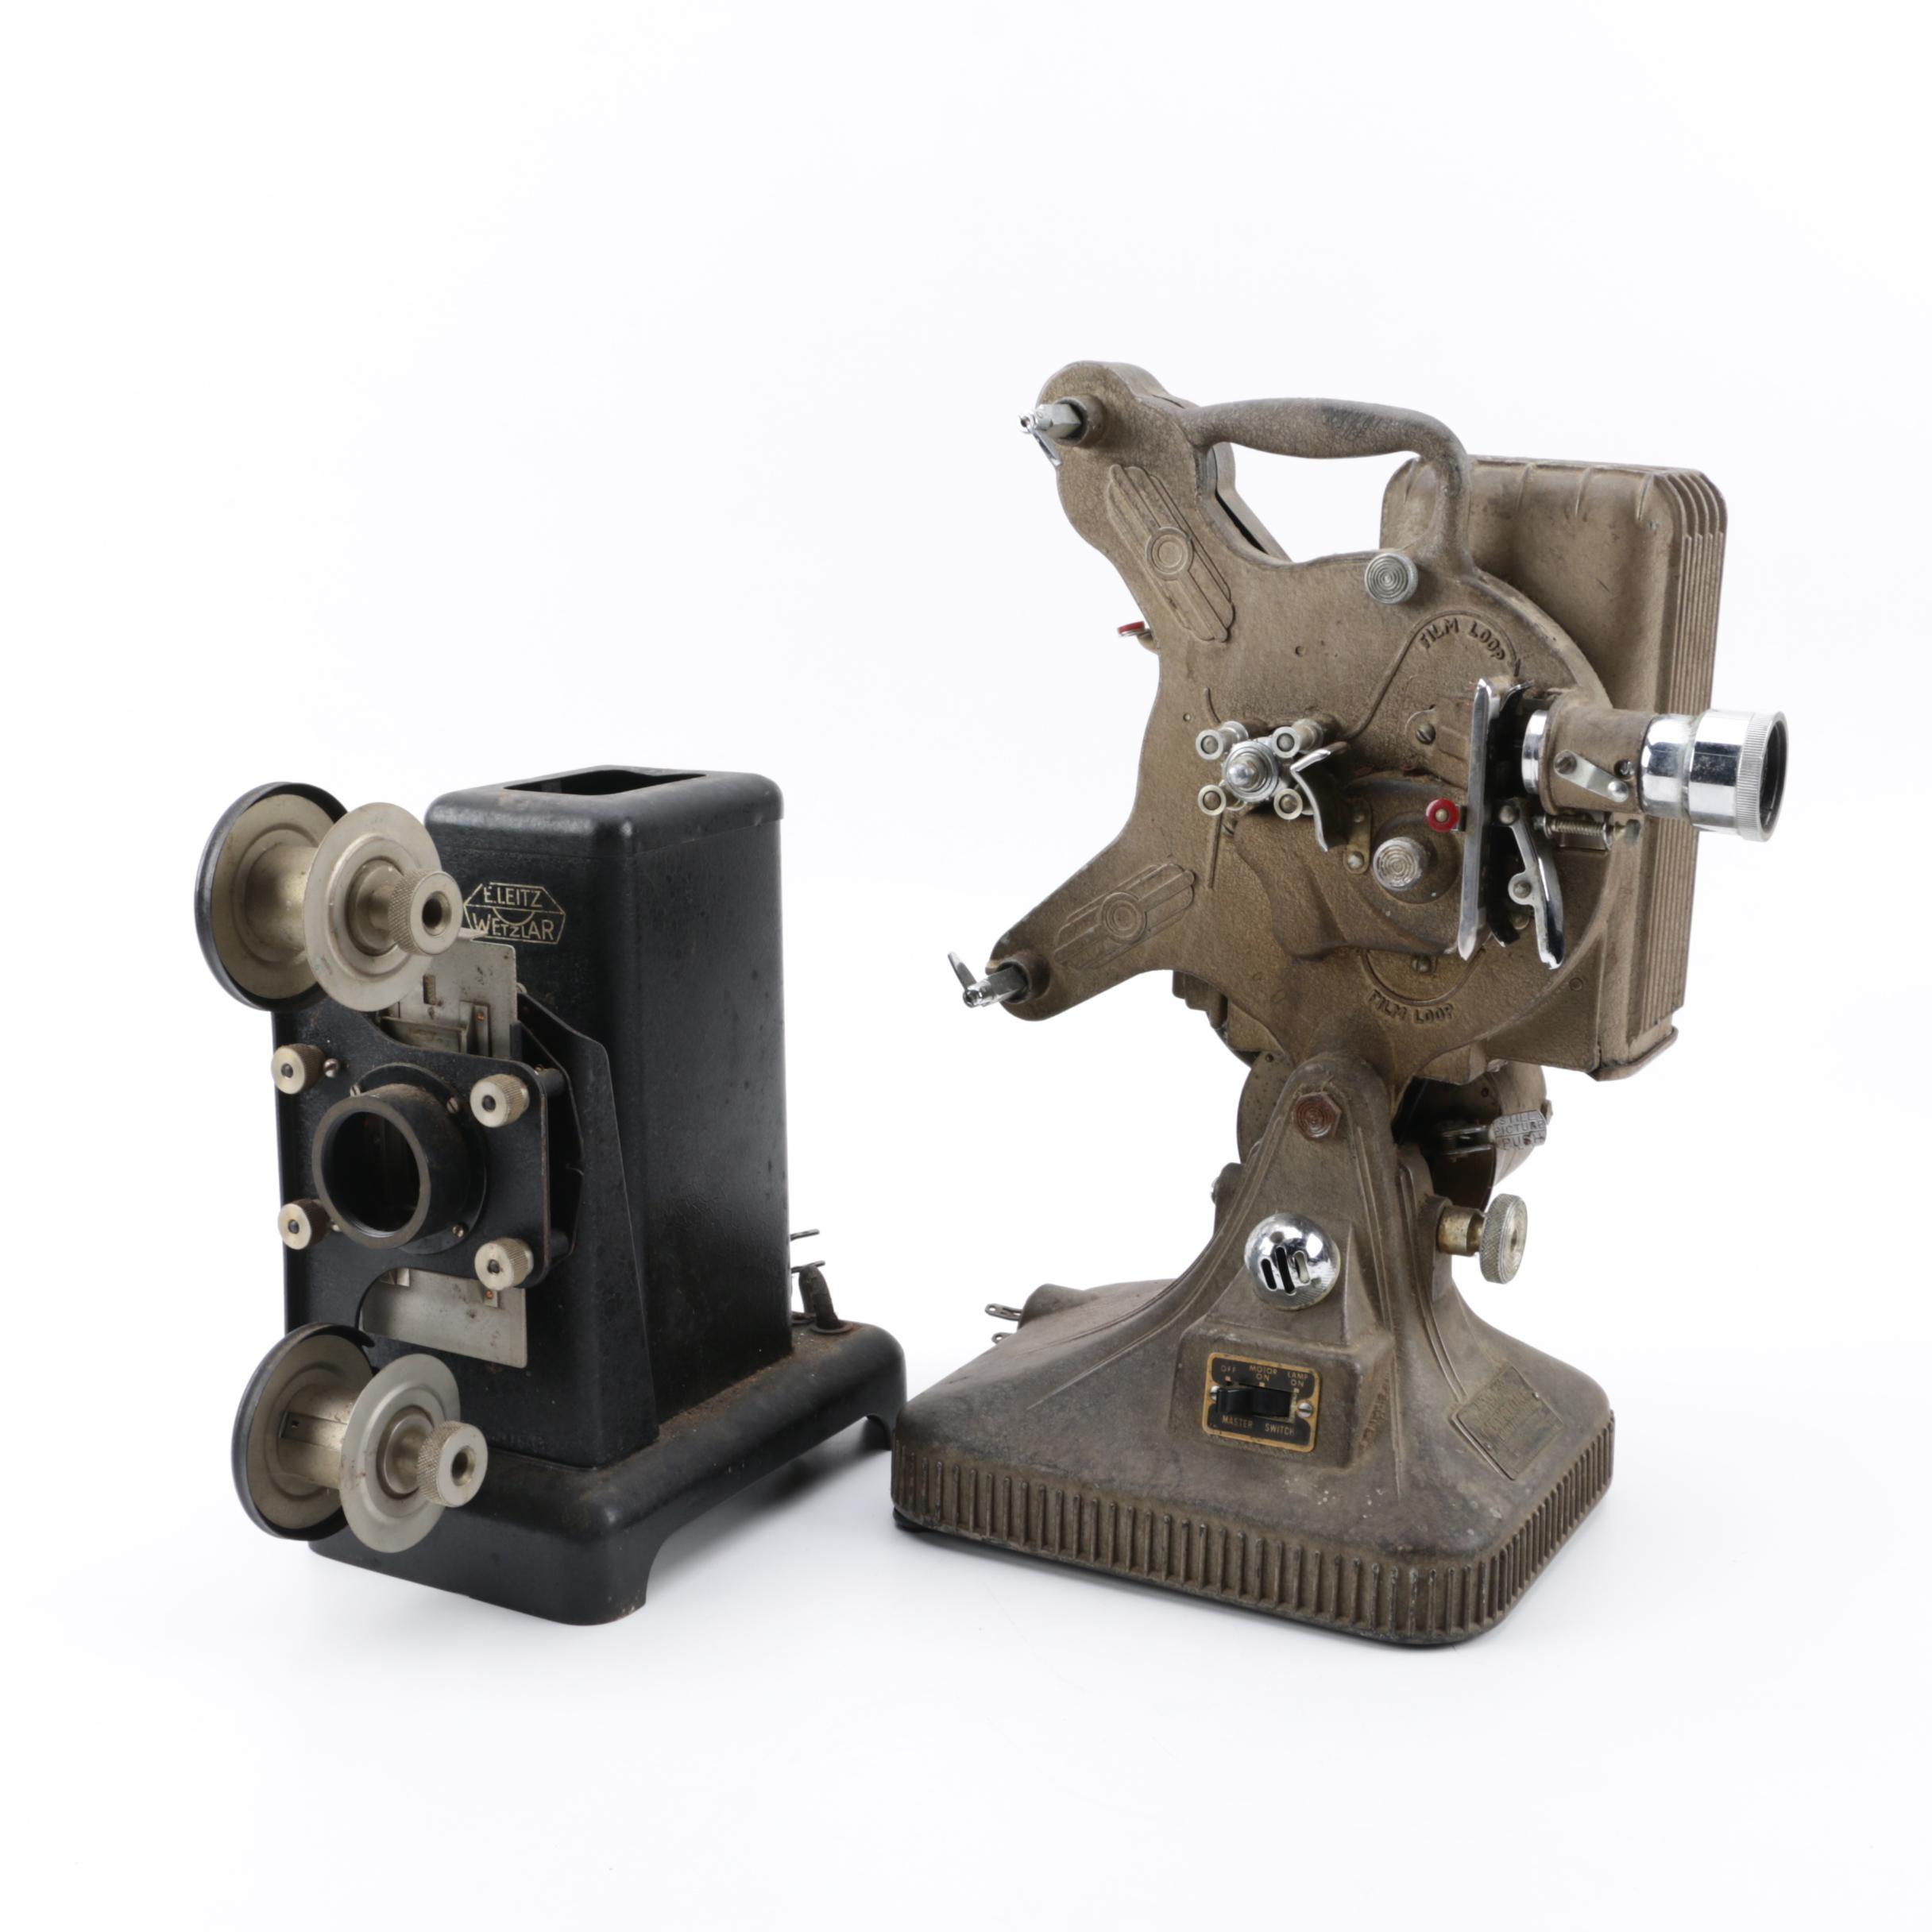 Vintage Keystone K-160 16mm Film Projector and 1930s E. Leitz Wetzlar Projector